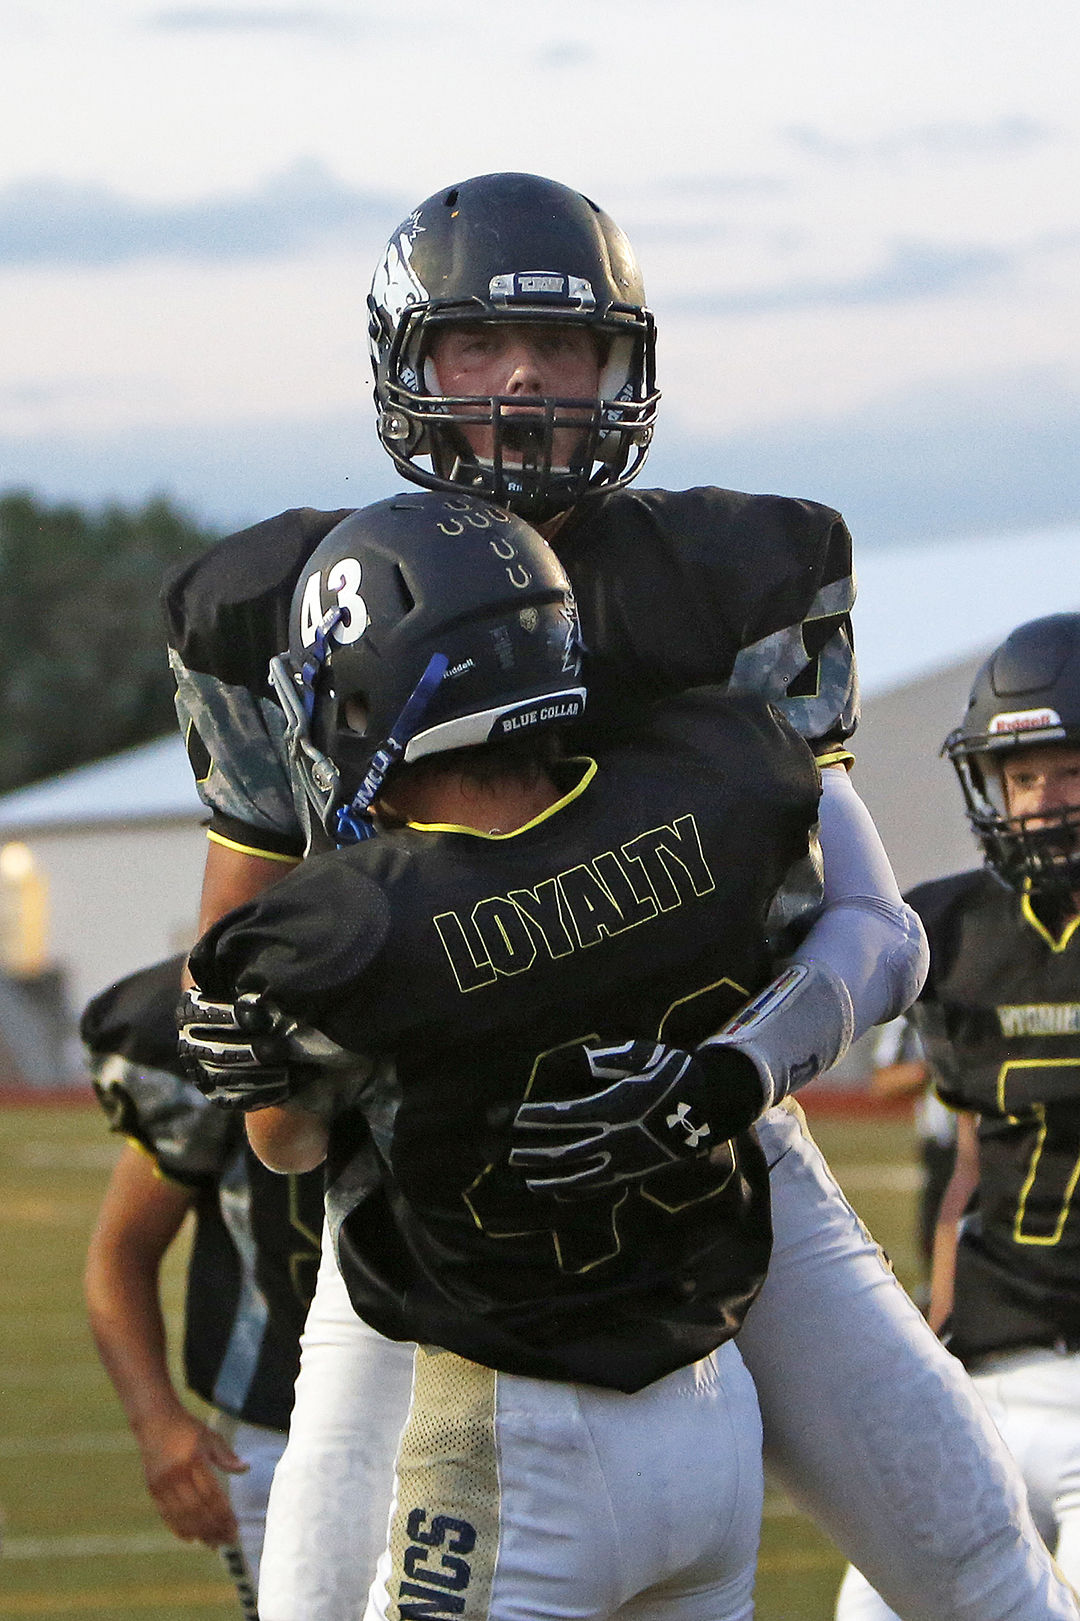 Cody football